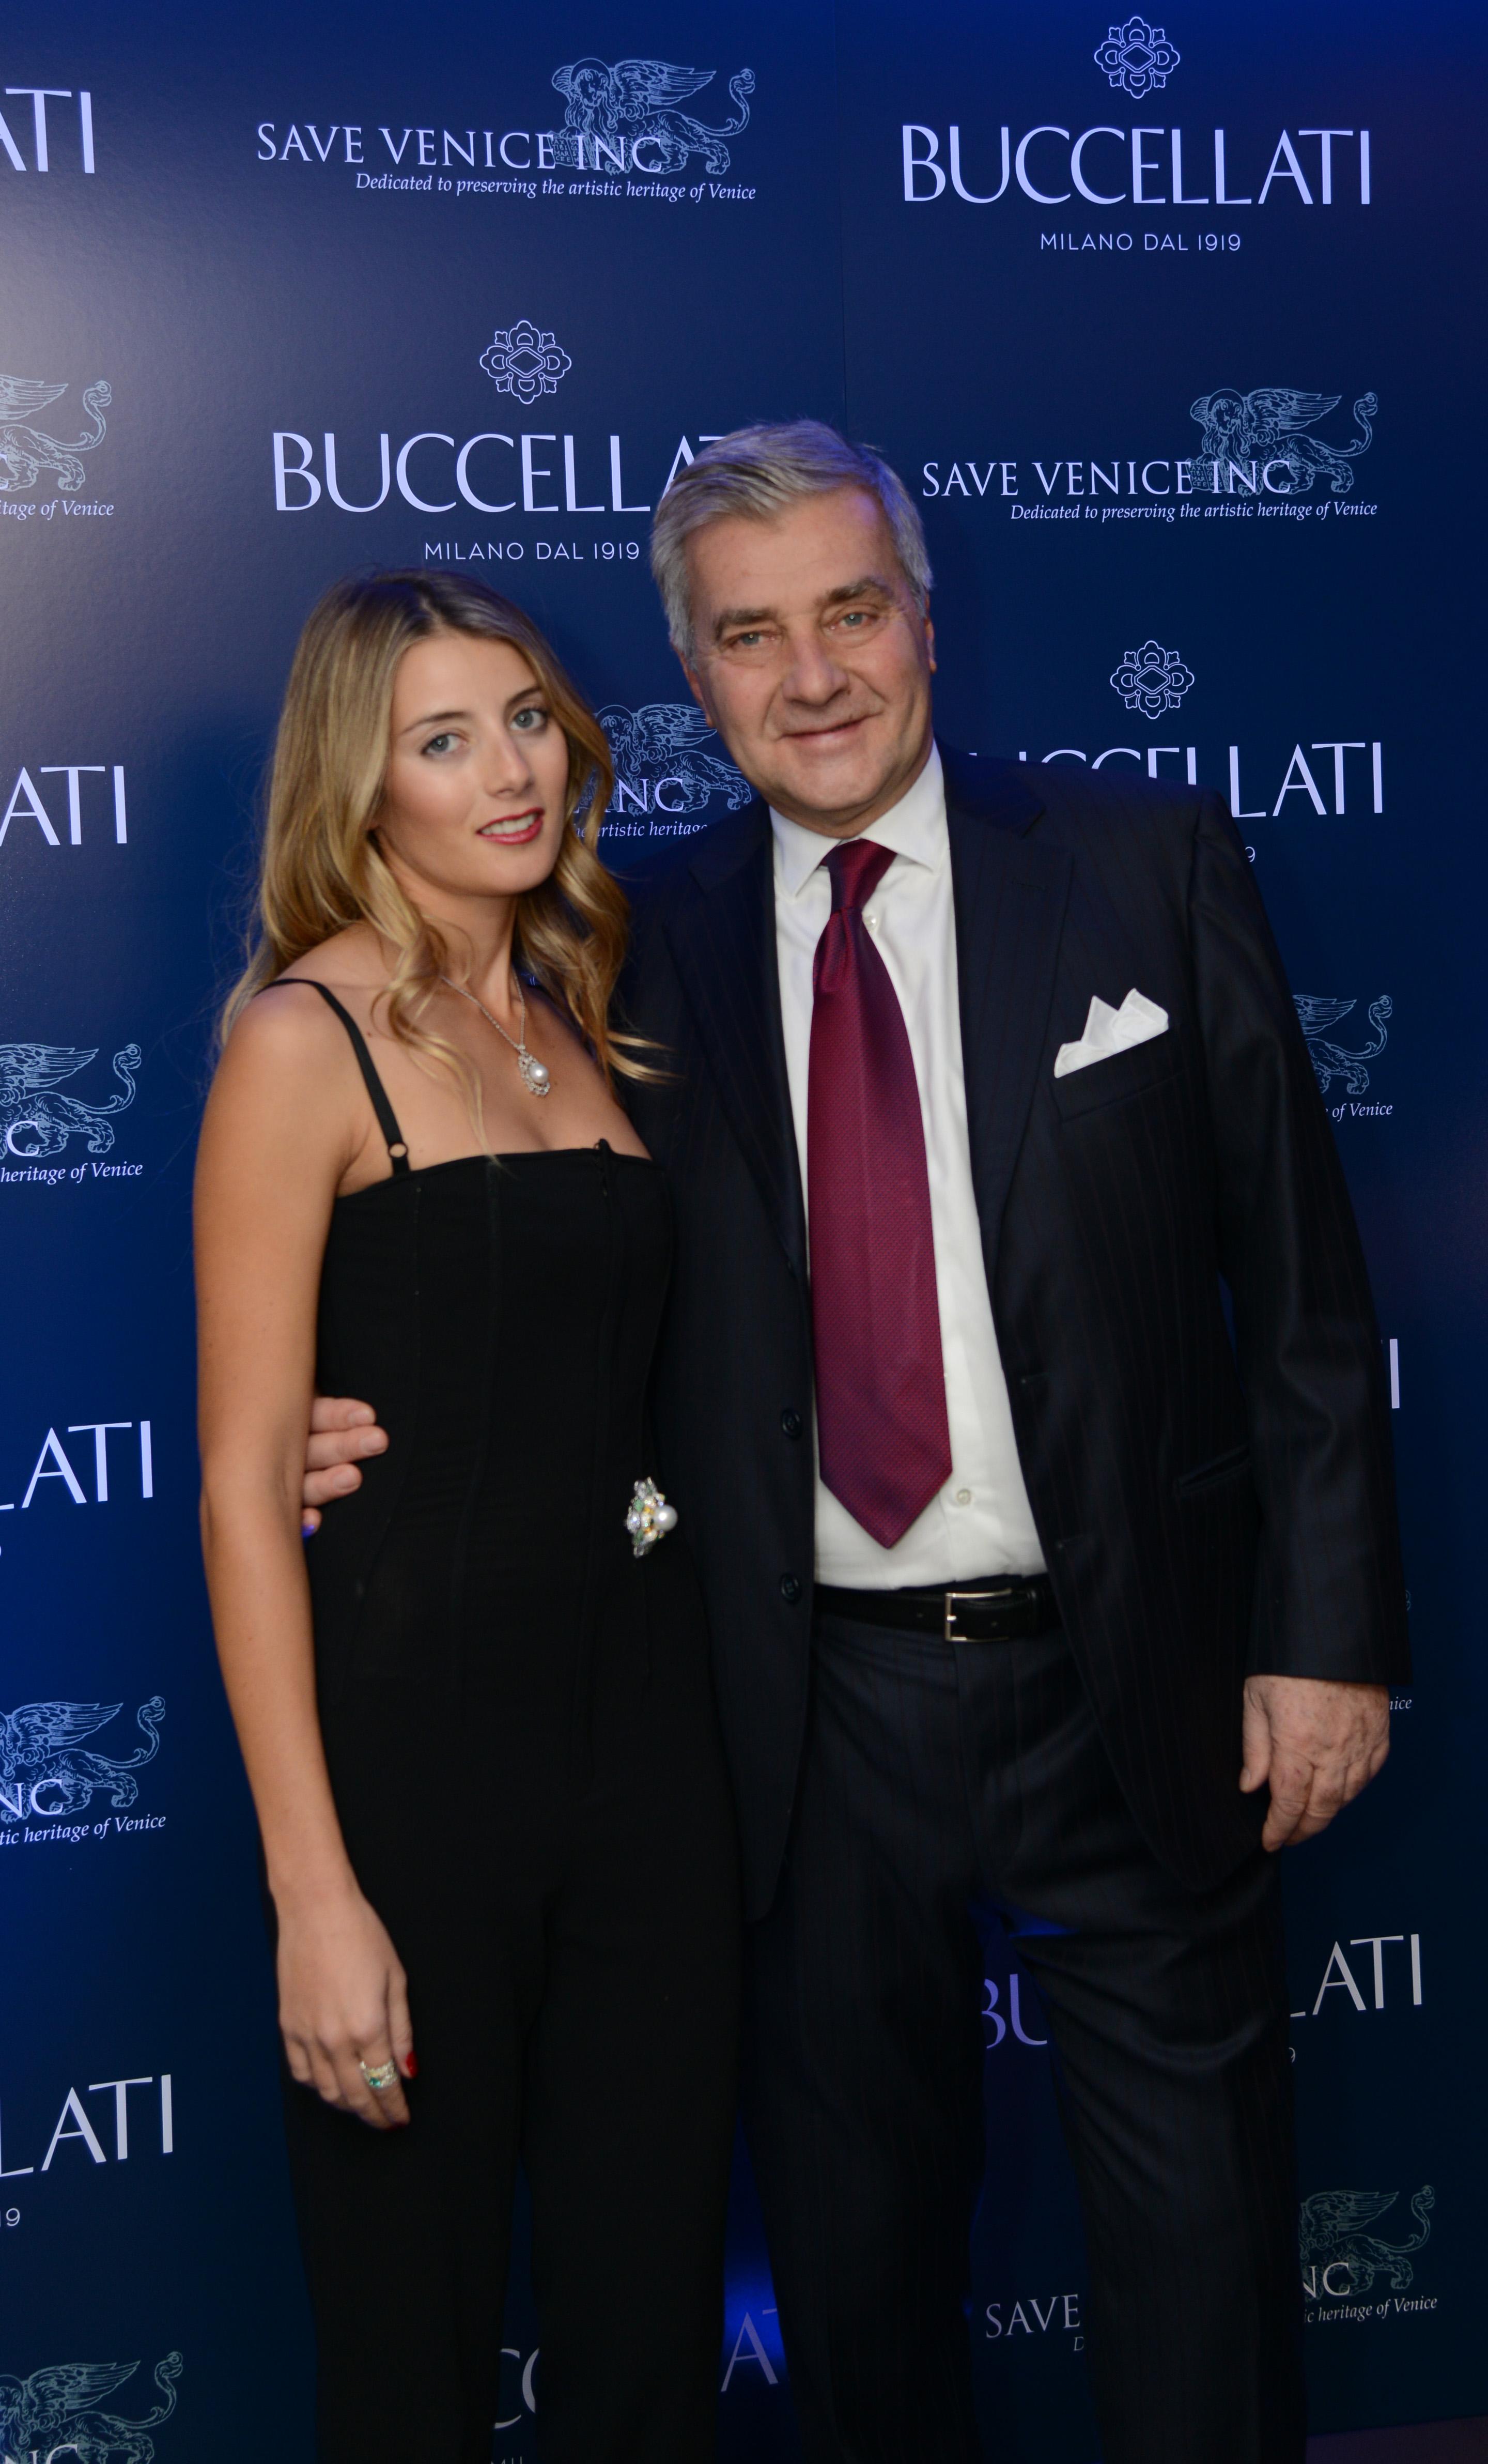 Lucrezia and Andrea Buccellati.